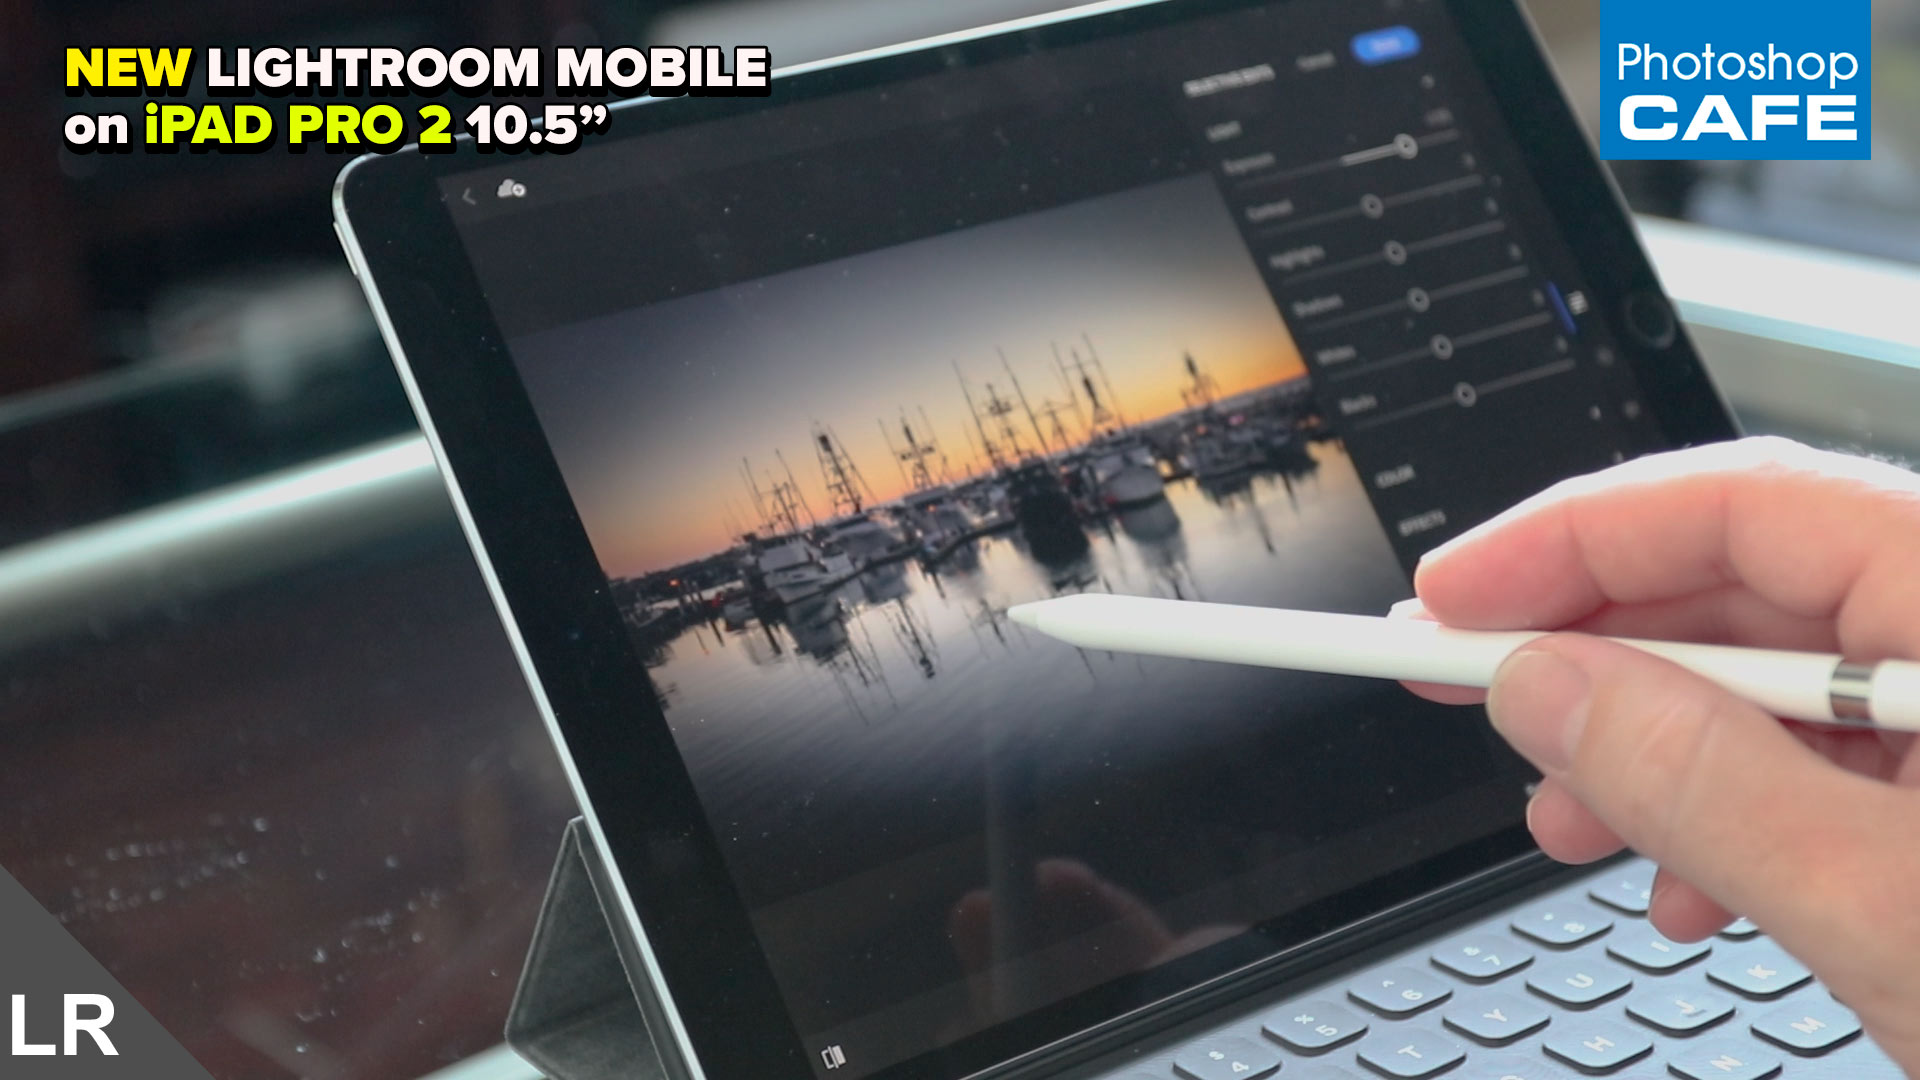 updated Lightroom Mobile on the iPad Pro 2 - PhotoshopCAFE